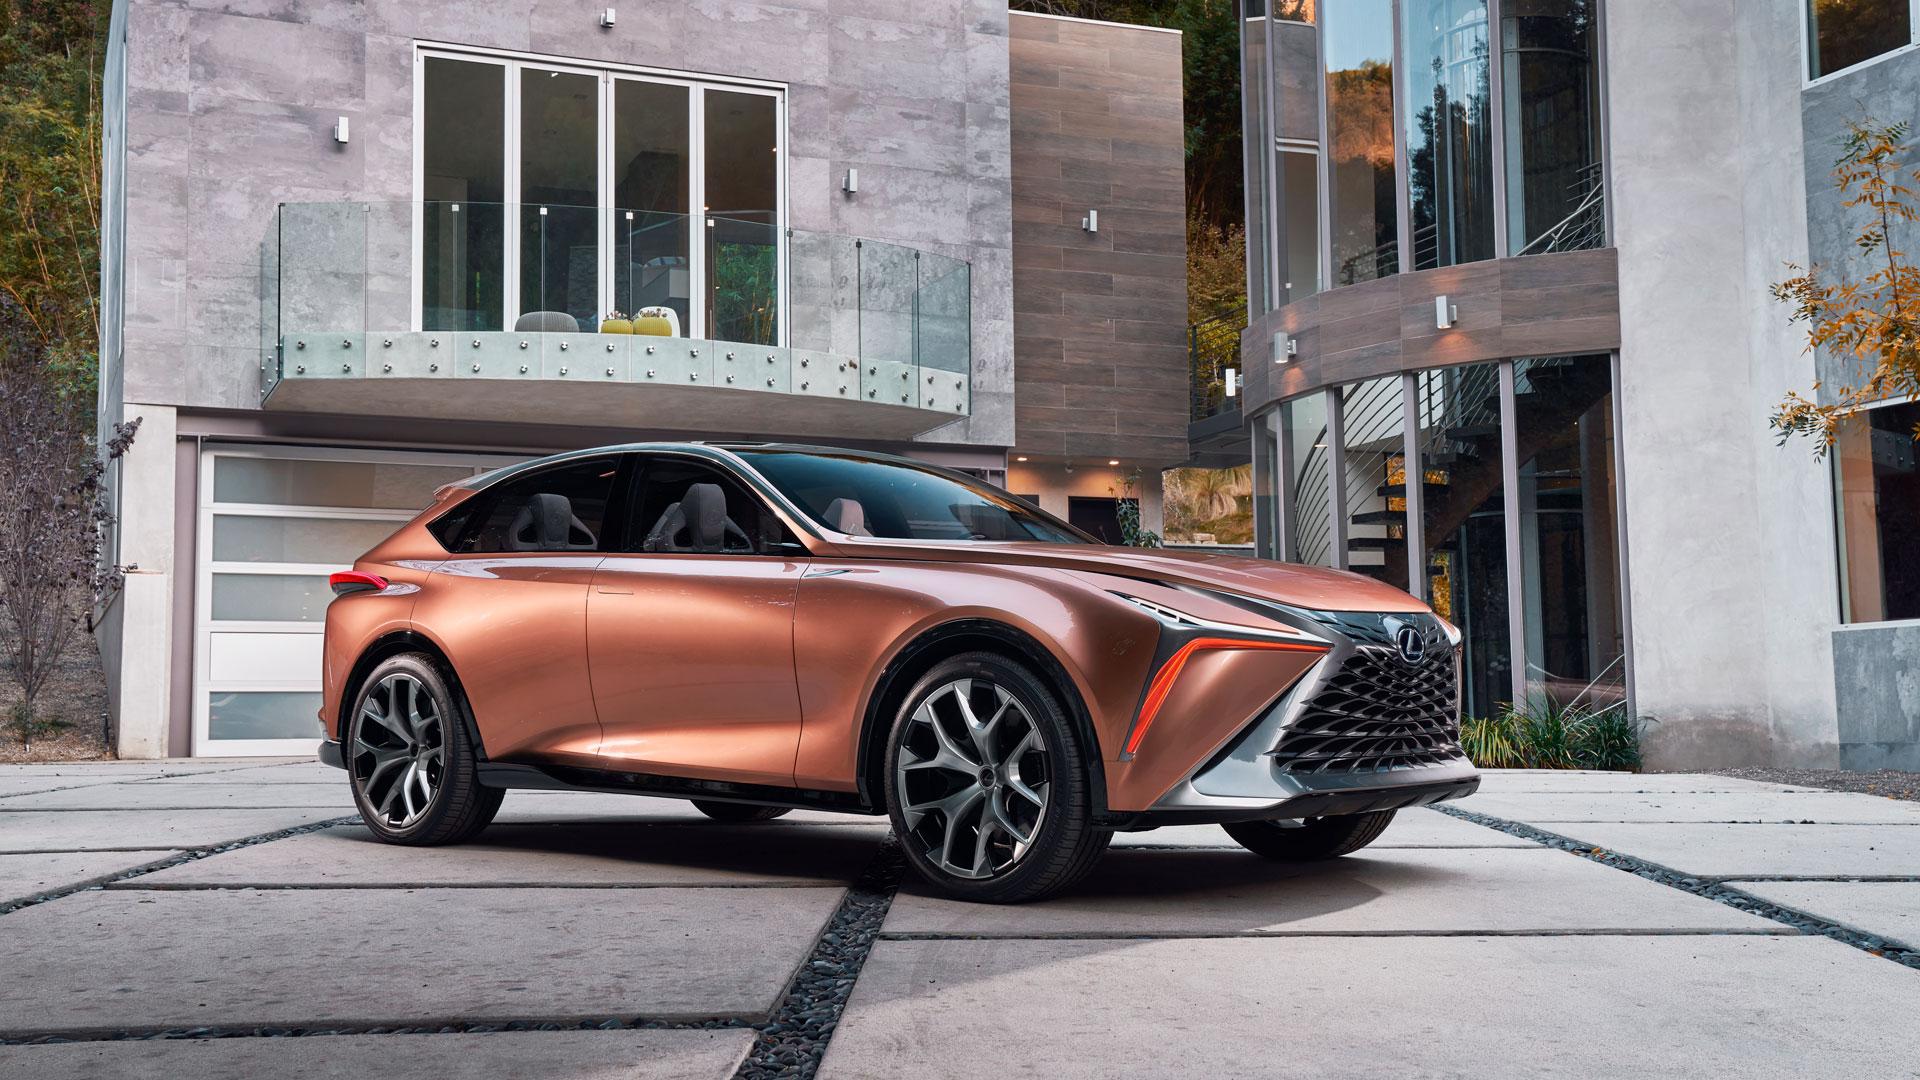 El concepto LF 1 de Lexus hero asset